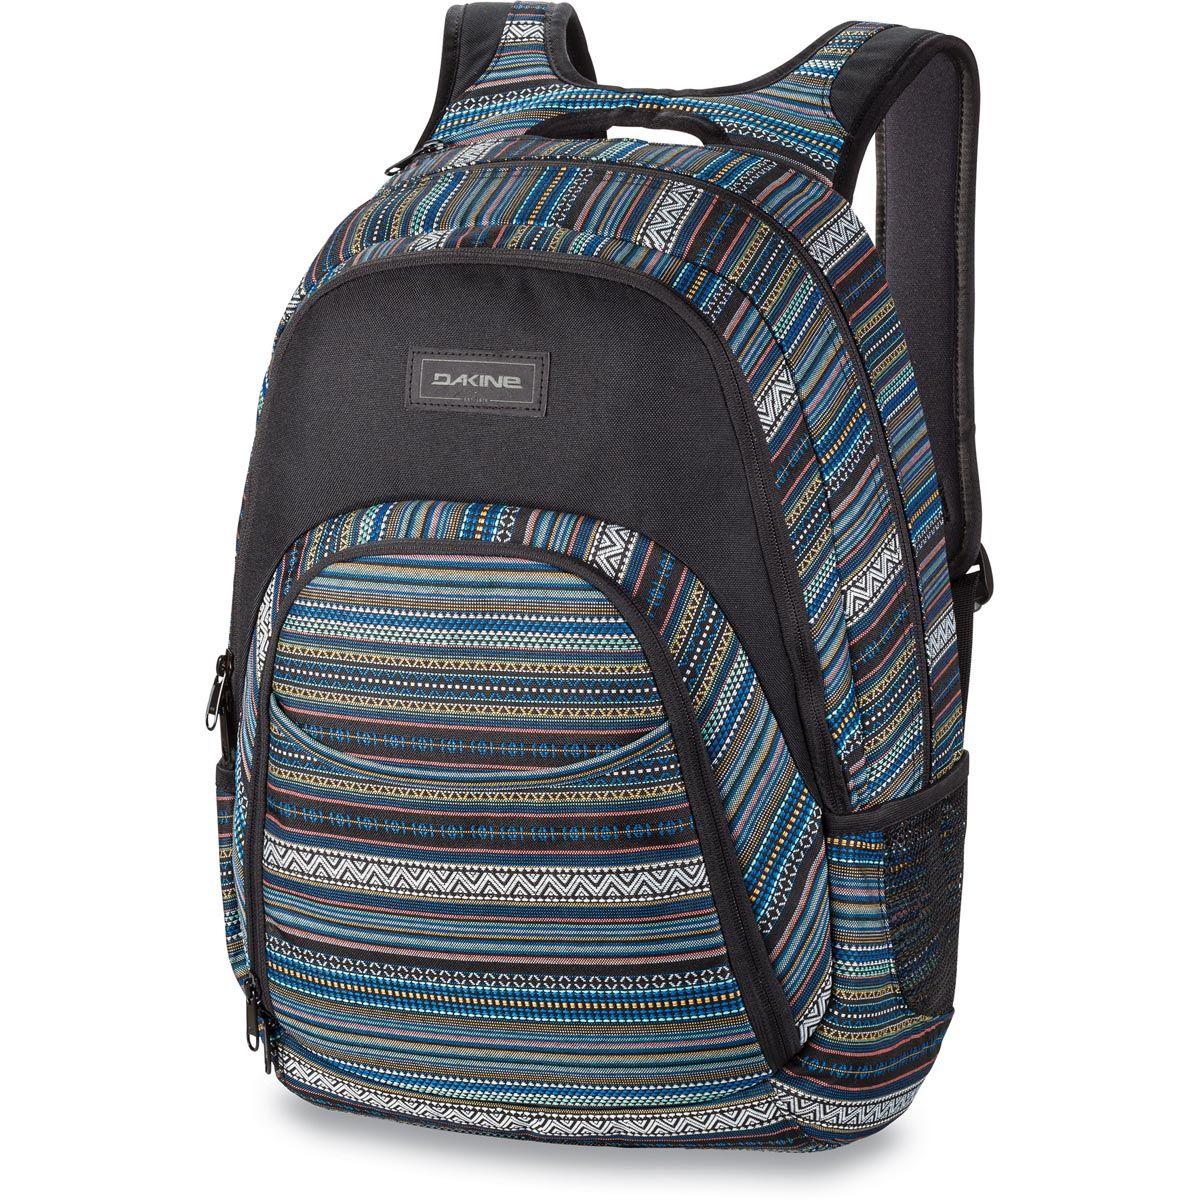 28293d902ac45 Dakine Eve 28L Backpack - Women s Laptop Rucksack